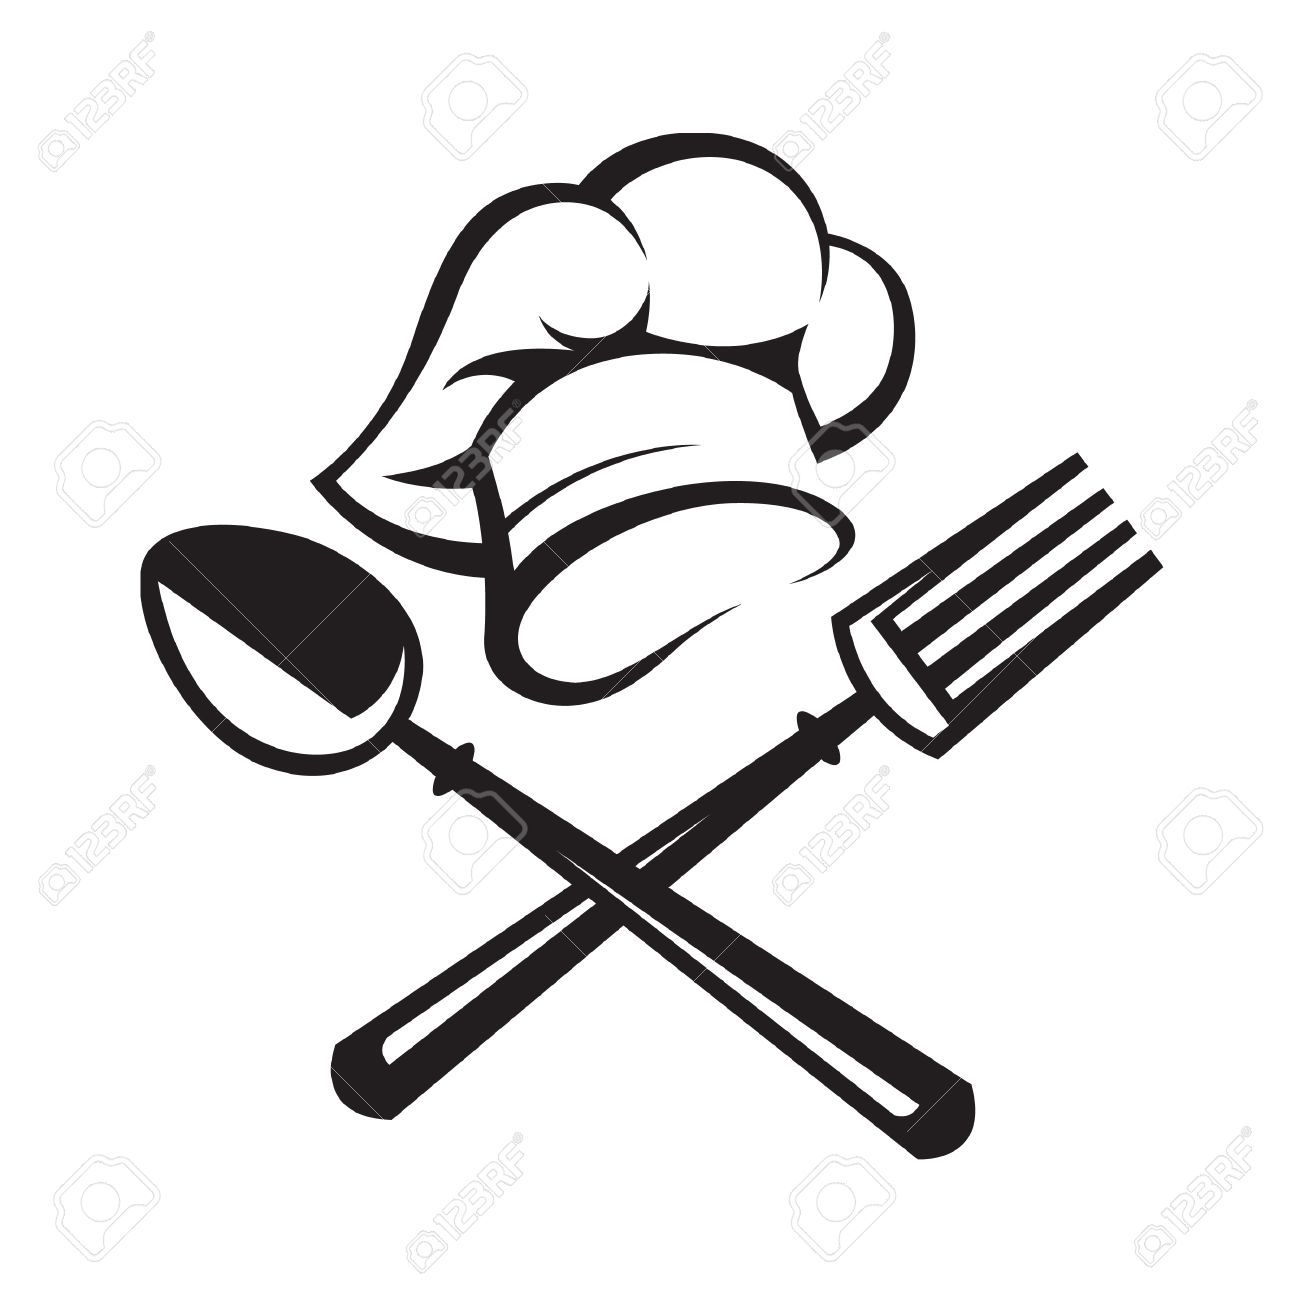 Chef utensils clipart 5 » Clipart Portal.